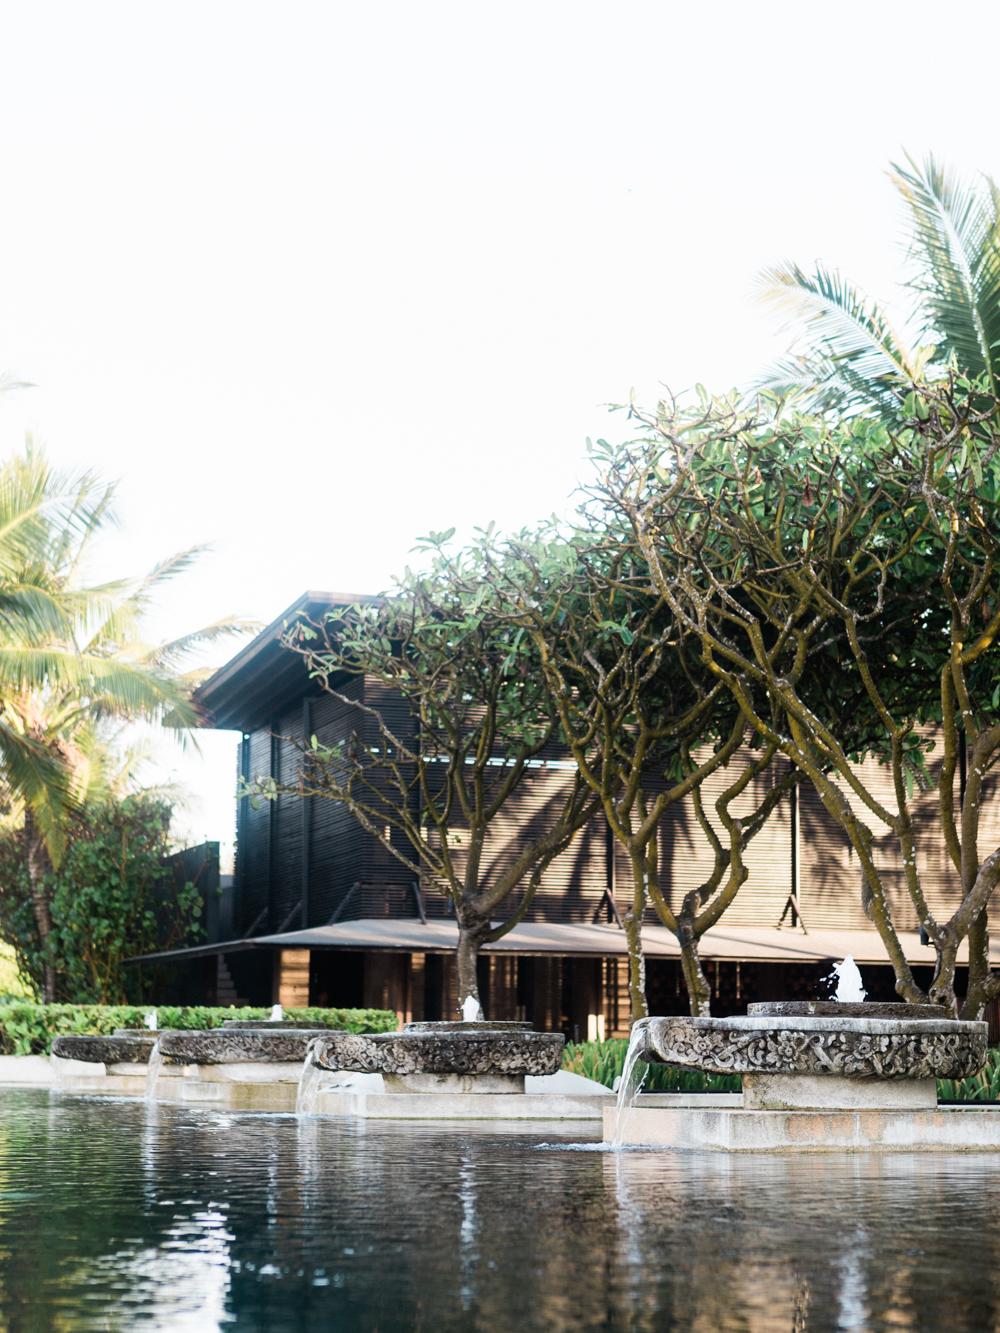 Bali_Real_Wedding_(c)_Rory_Wylie-4.jpg